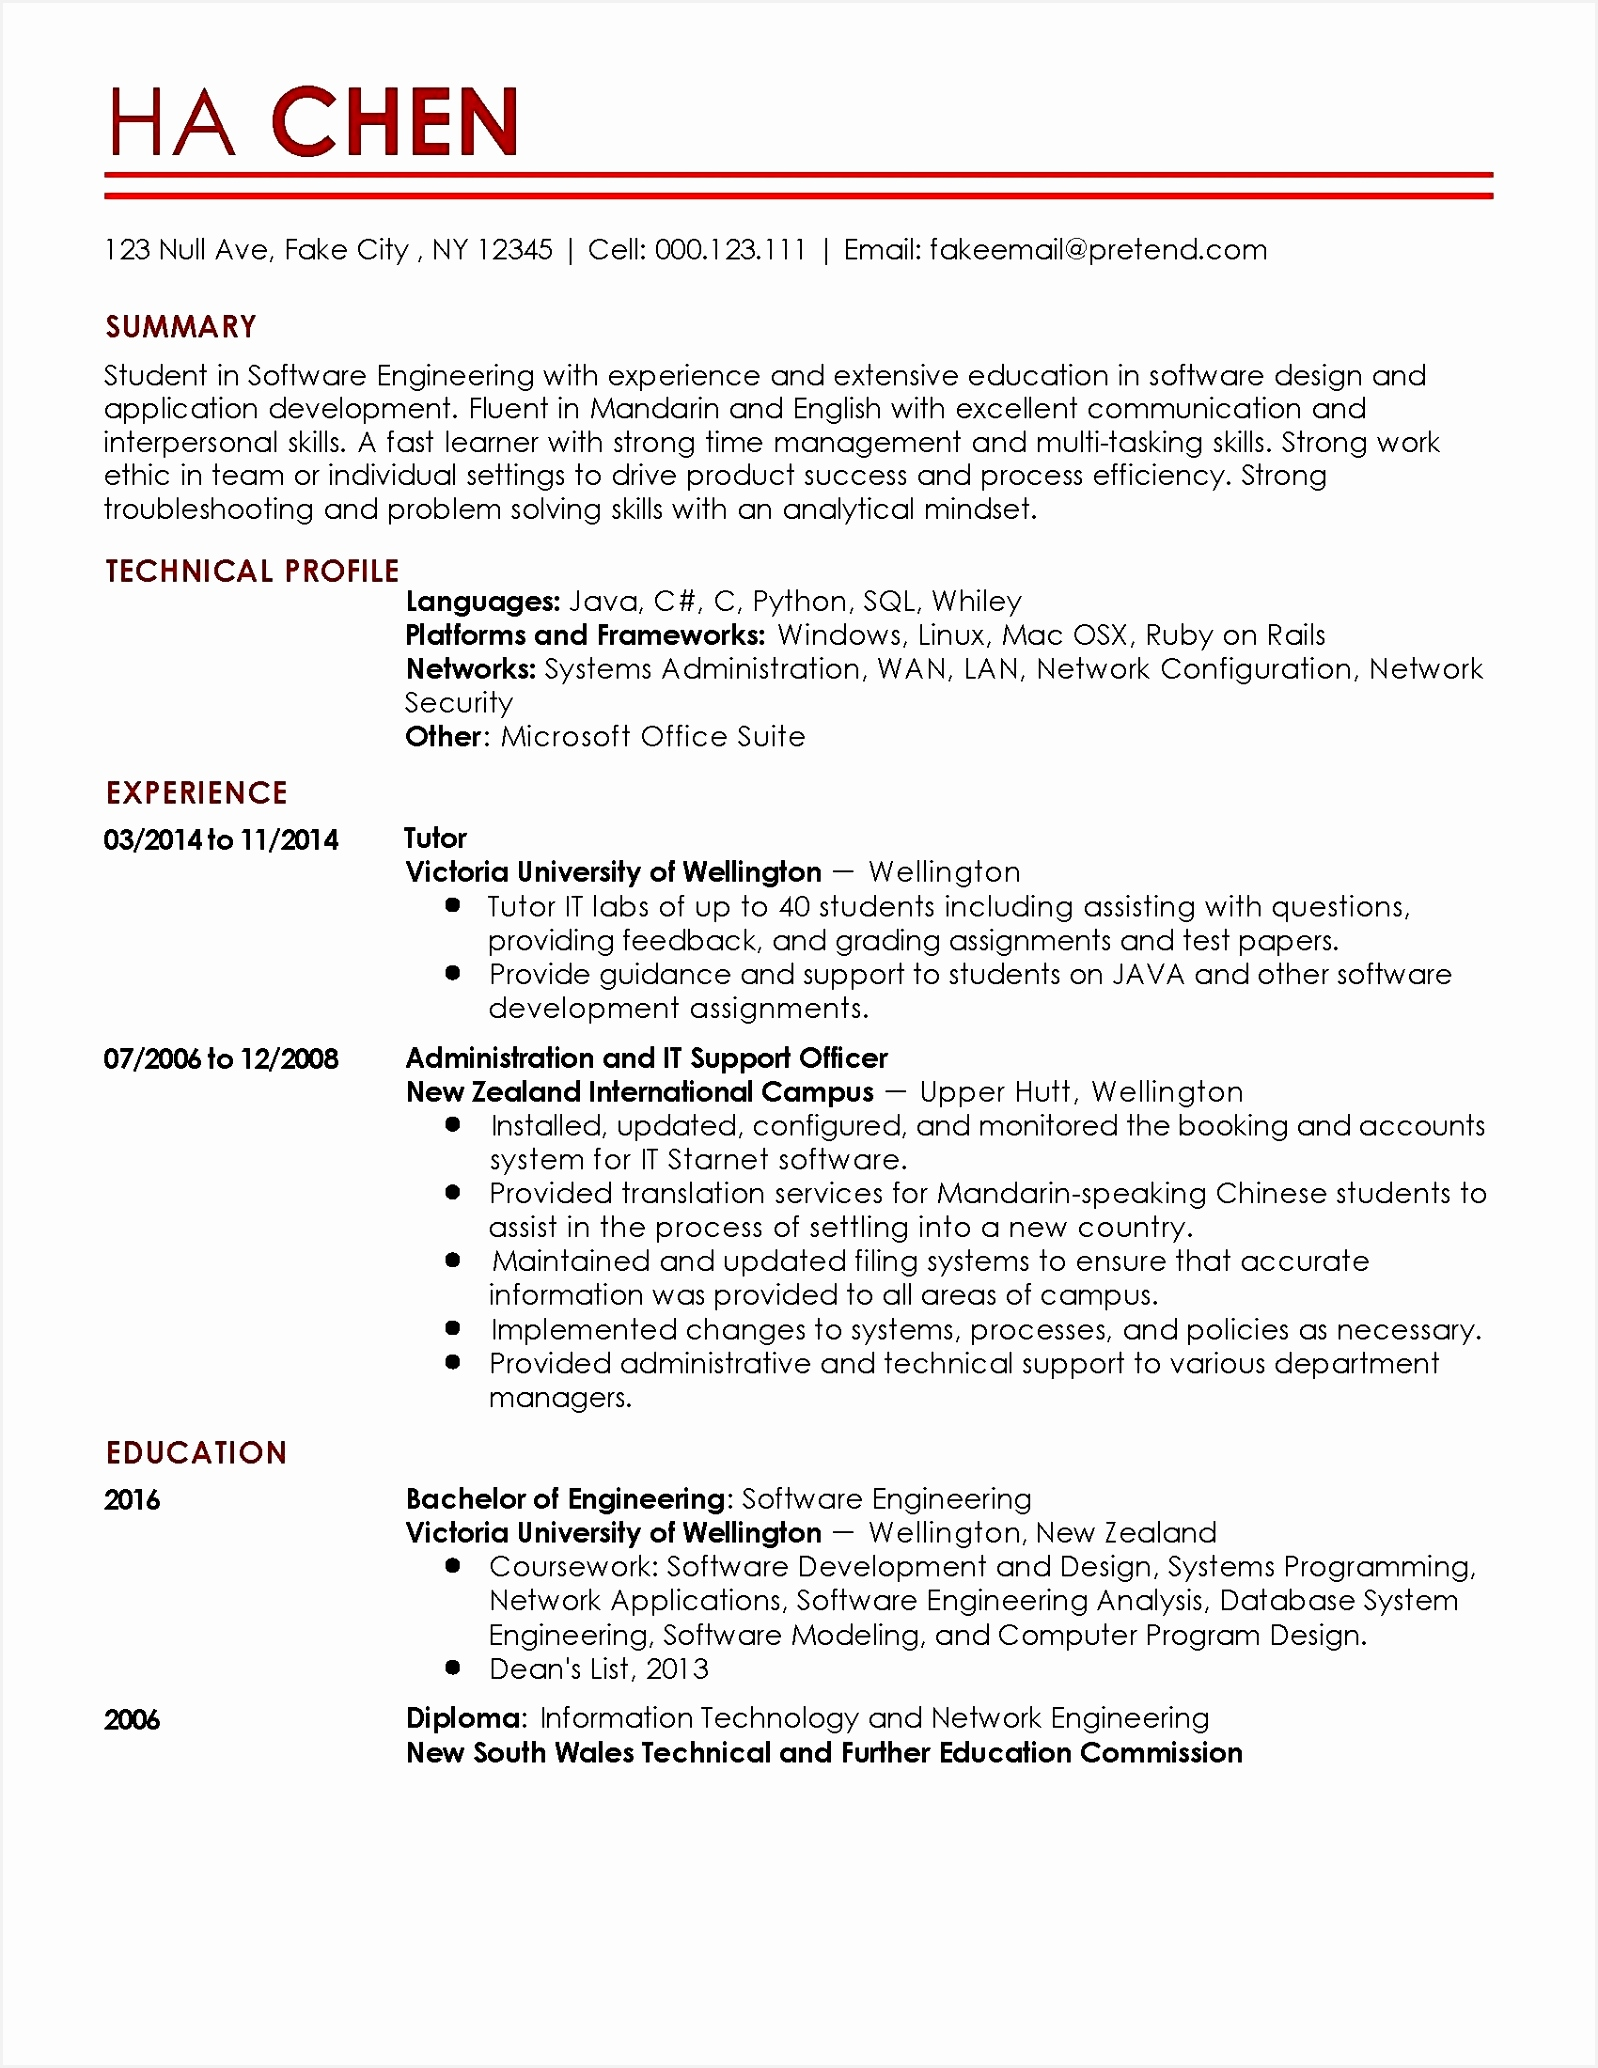 Administrative Resume Sample Fresh Resume Objective Samples Lovely Resume Examples 0d Good Looking 20681598vhVhz